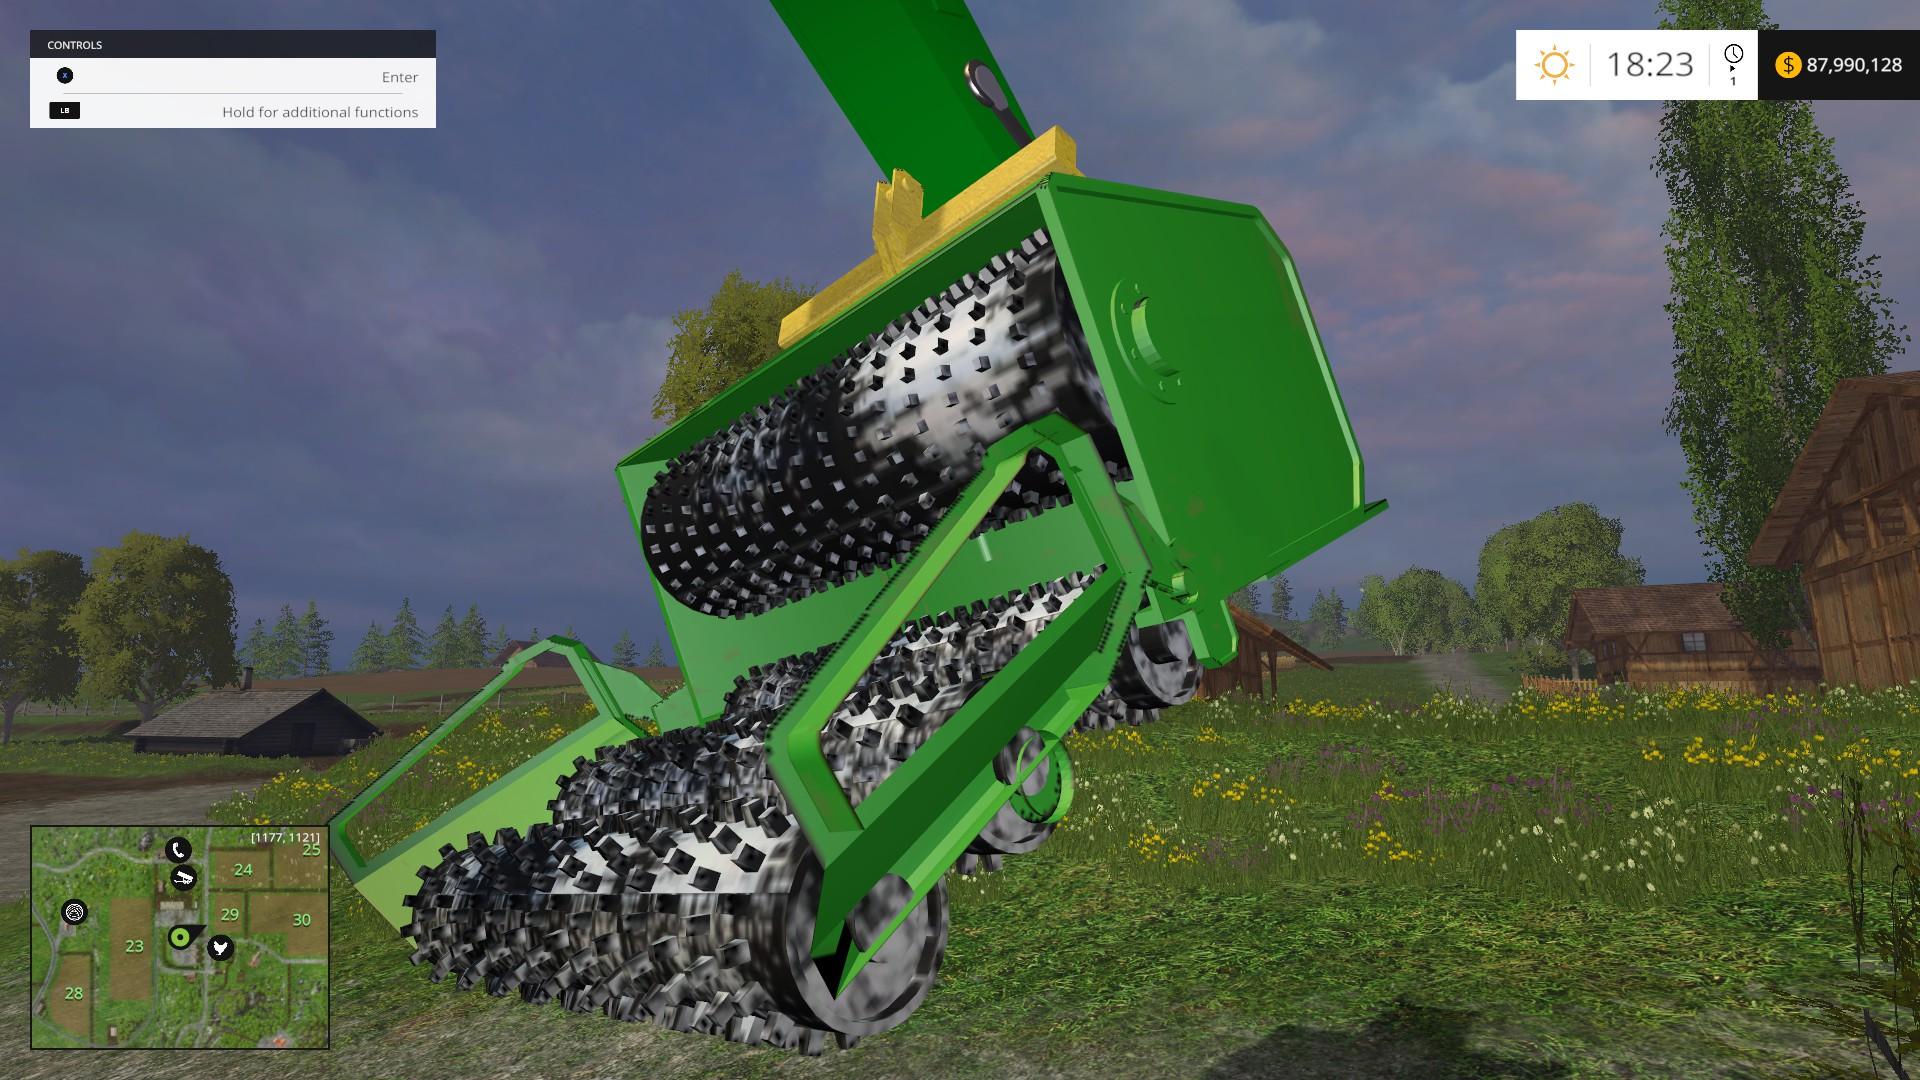 Excavator Chipper Attachment LS 15 - Farming simulator 2019